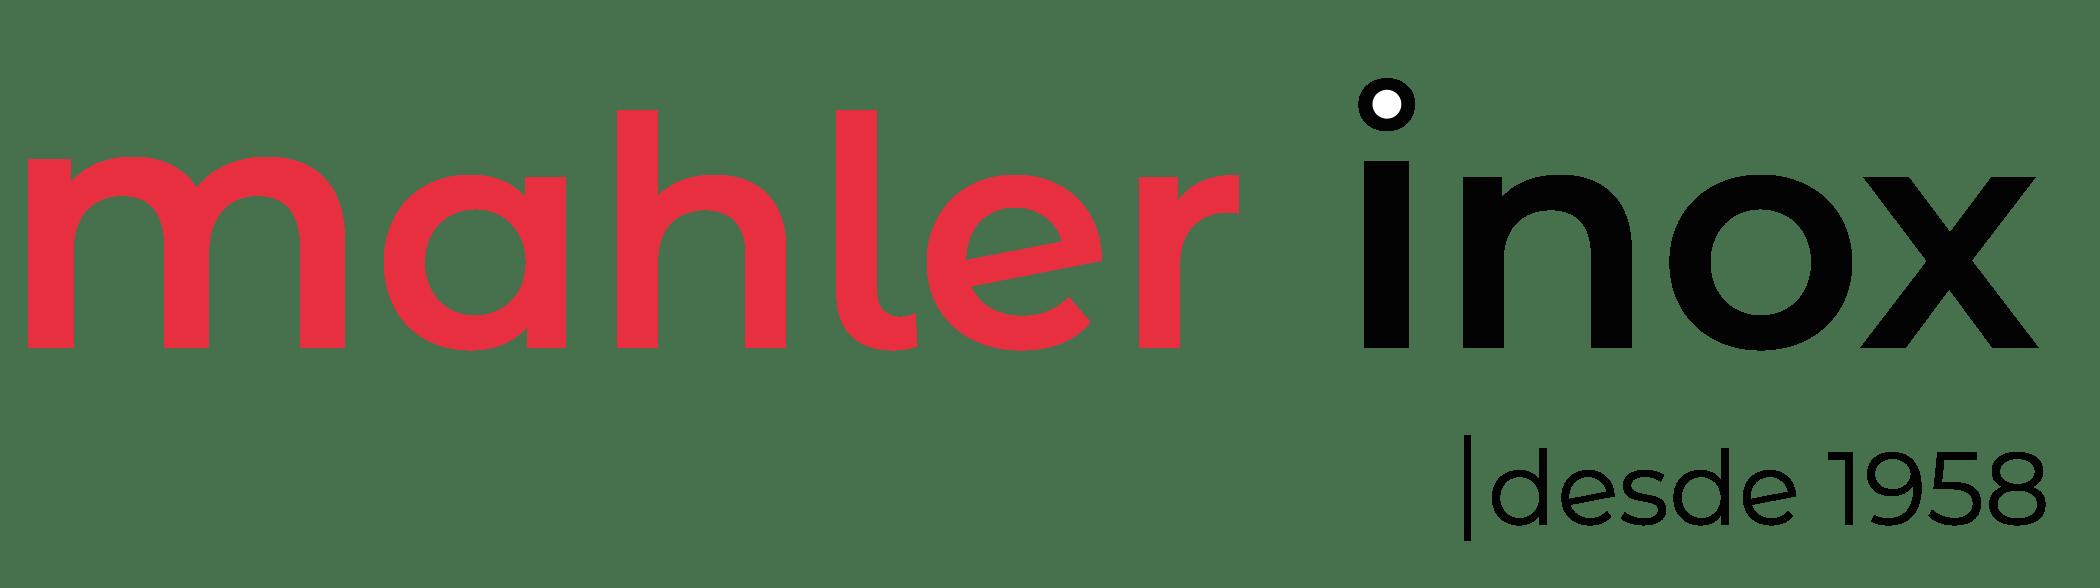 Metalúrgica Mahler Inox